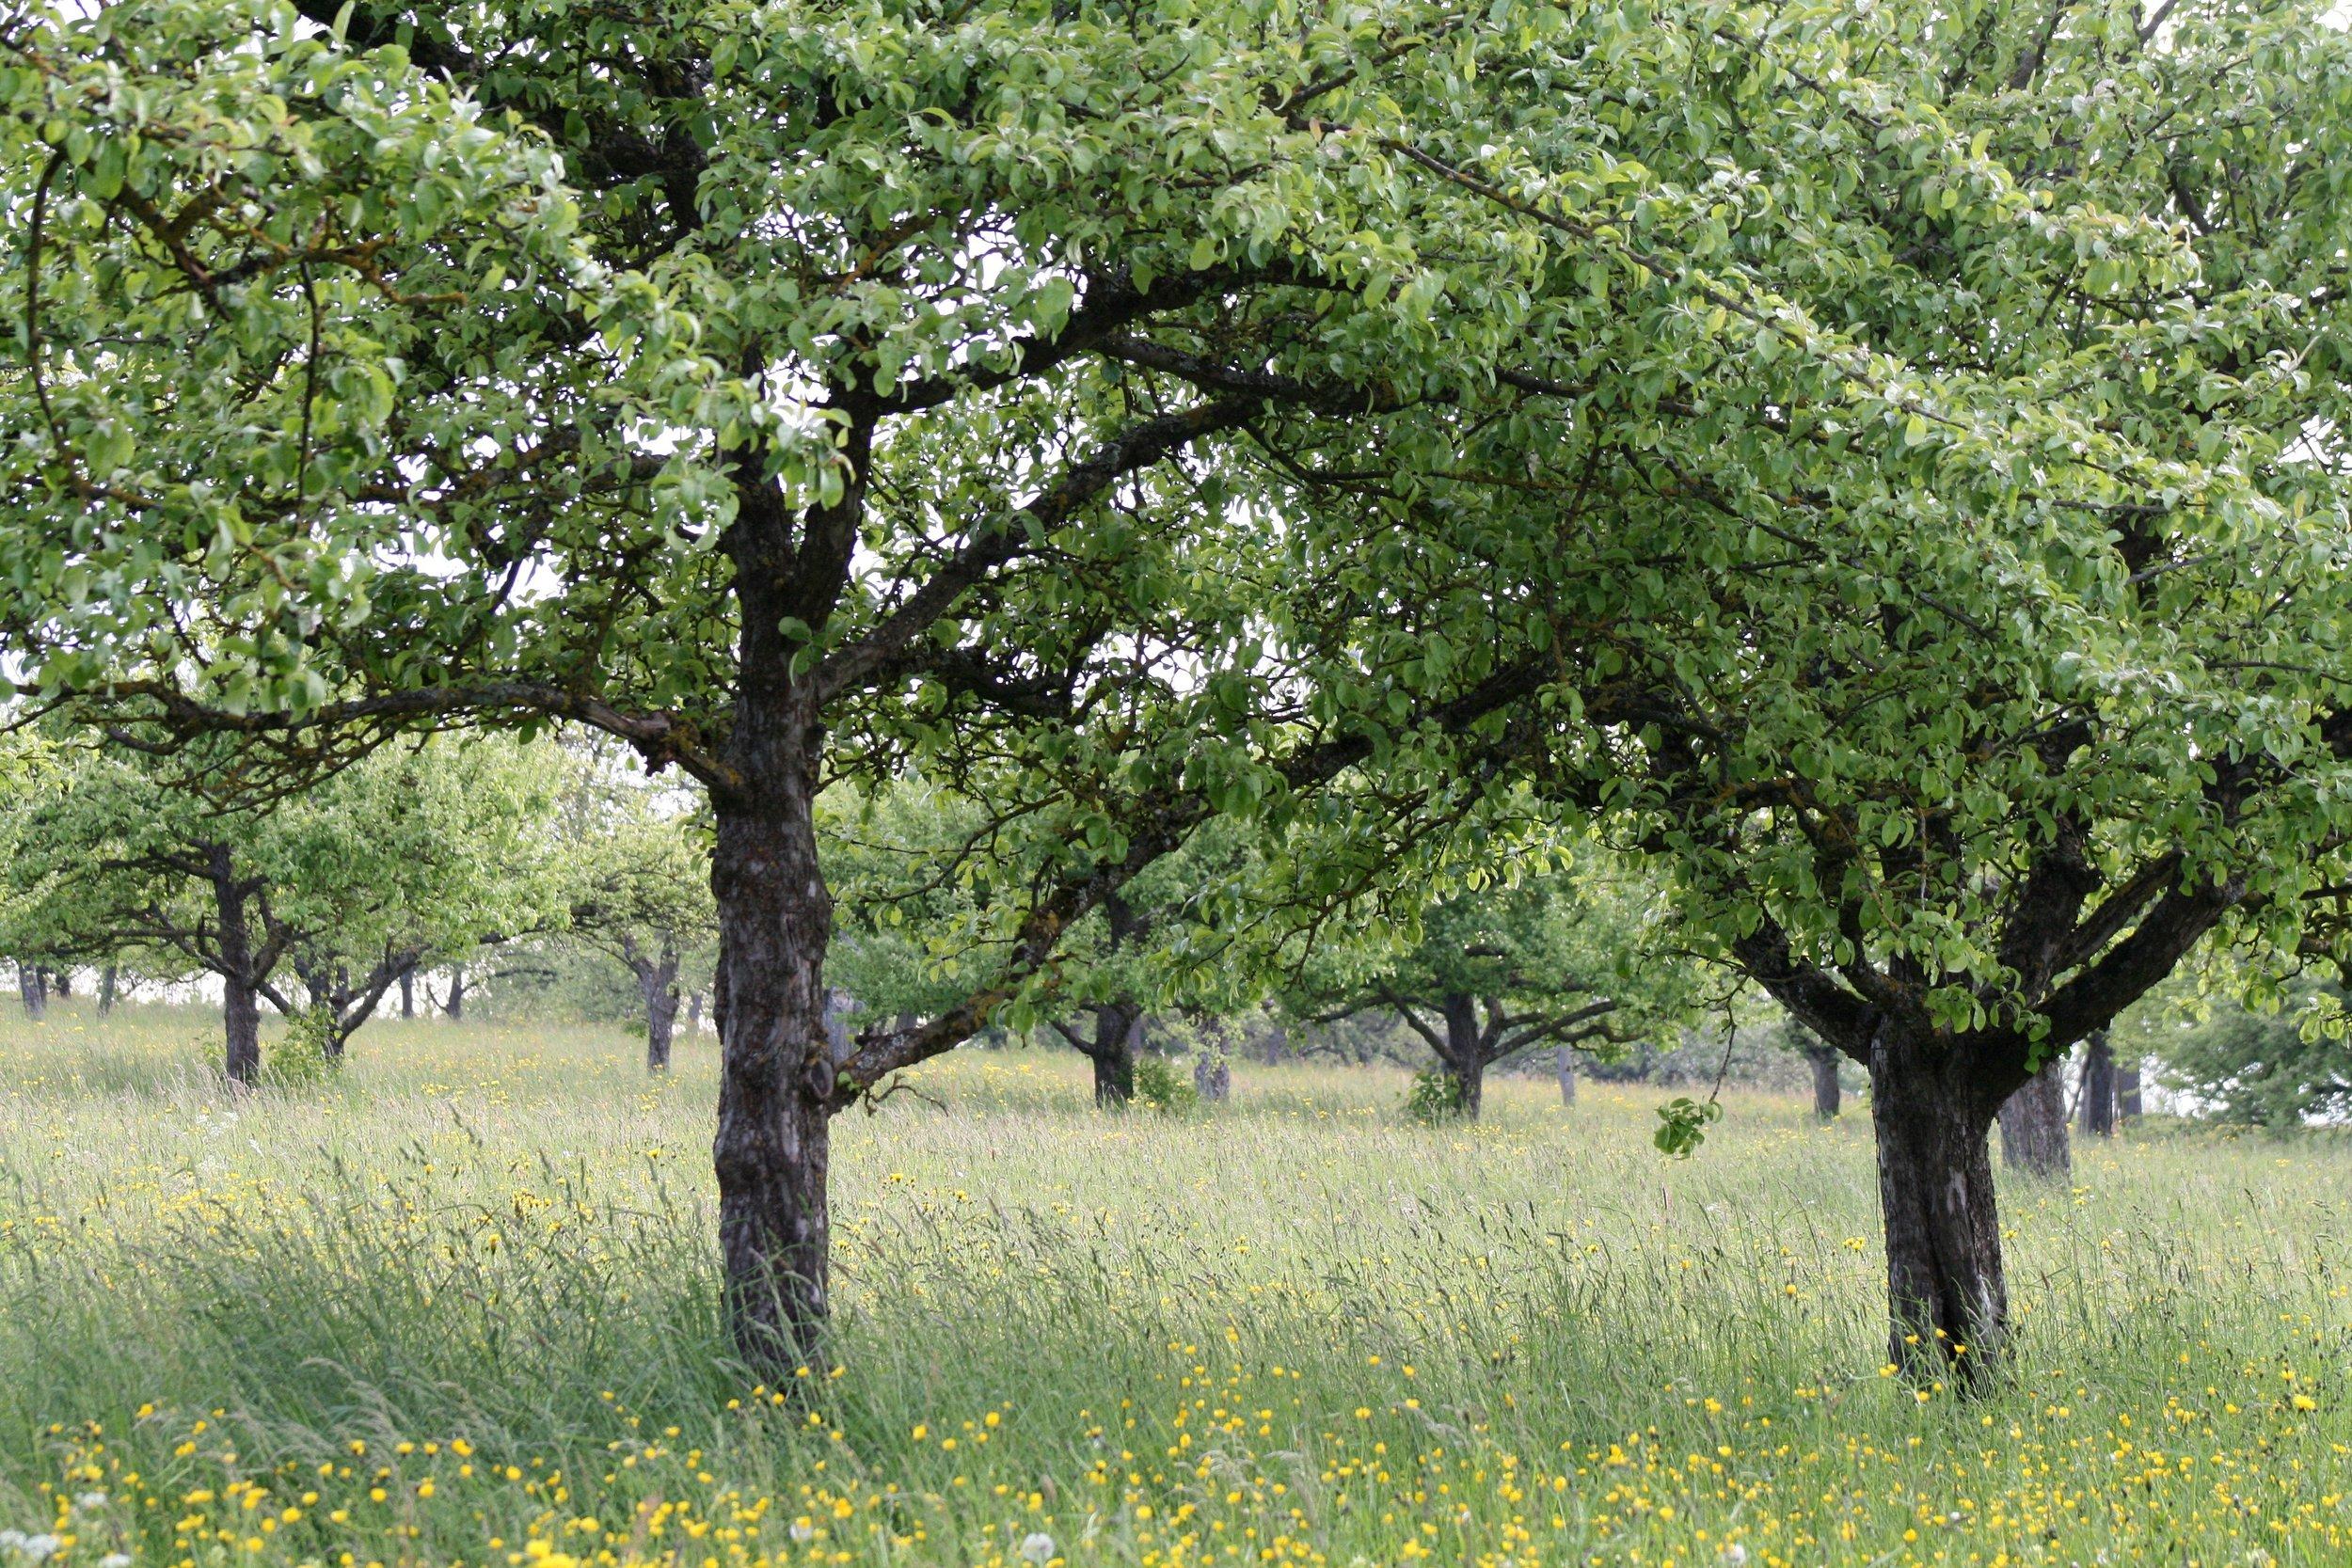 landscape-tree-nature-blossom-plant-flower-827286-pxhere.com.jpg